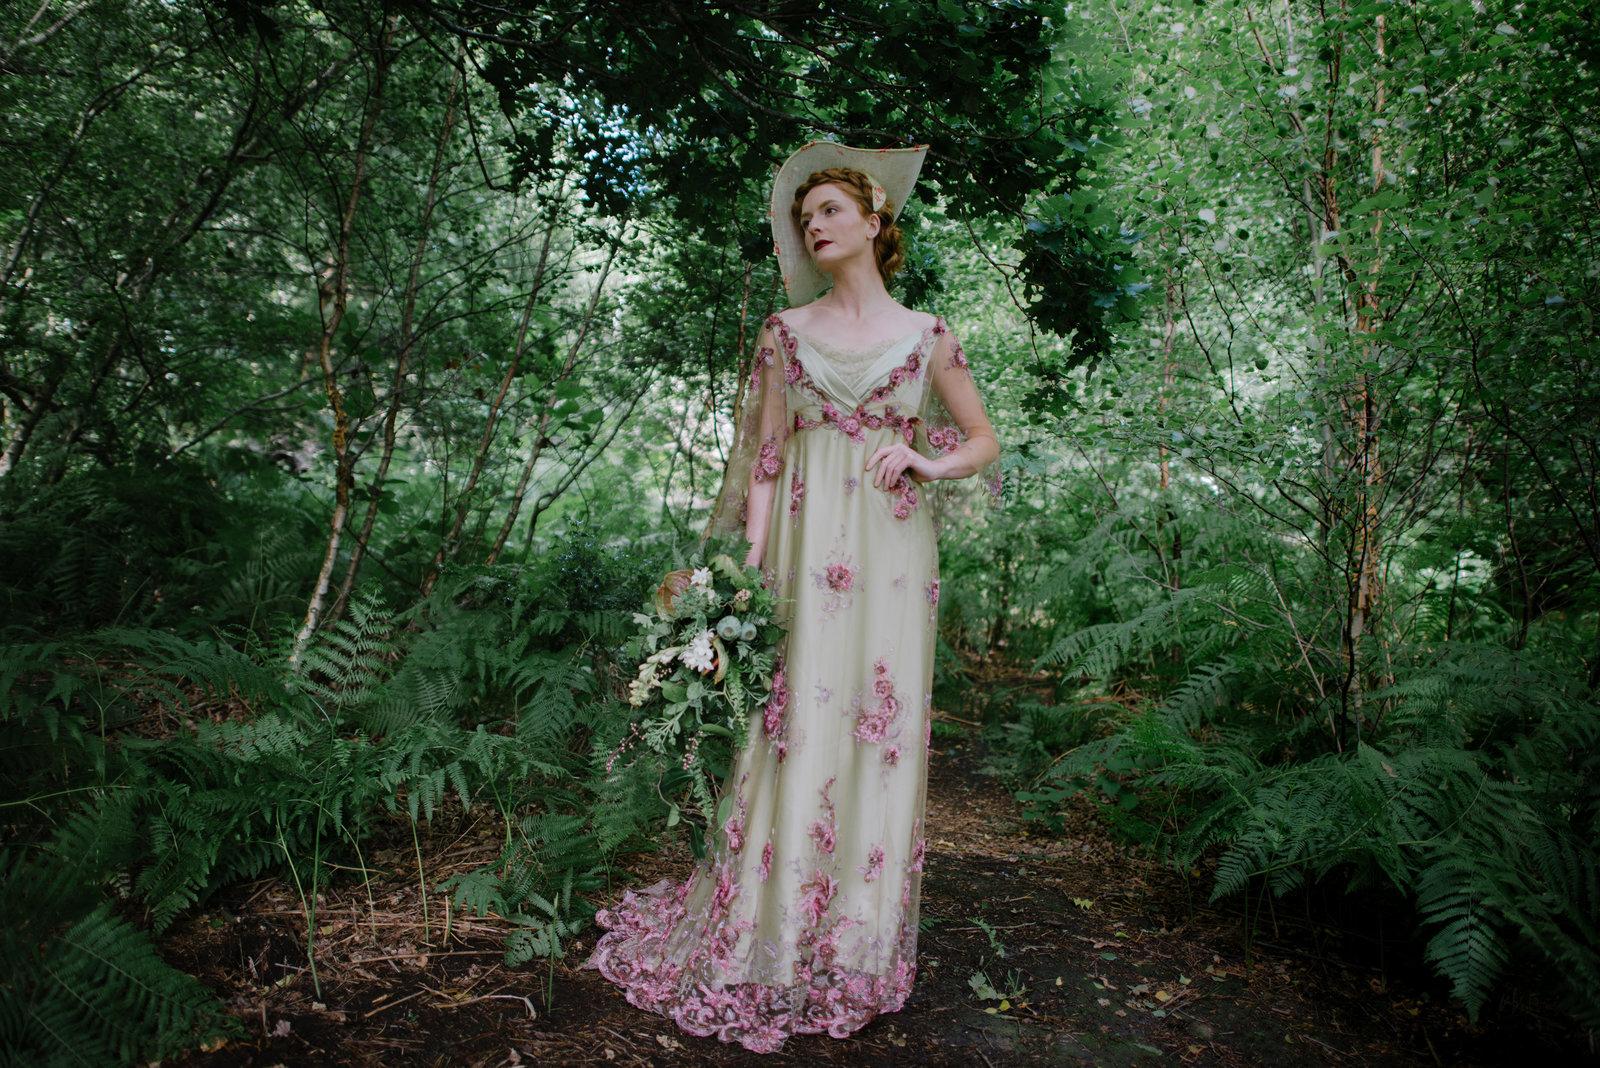 Gainsborough_belle_epoque_green_lilac_wedding_dress_JoanneFlemingDesign_JMS (6)web